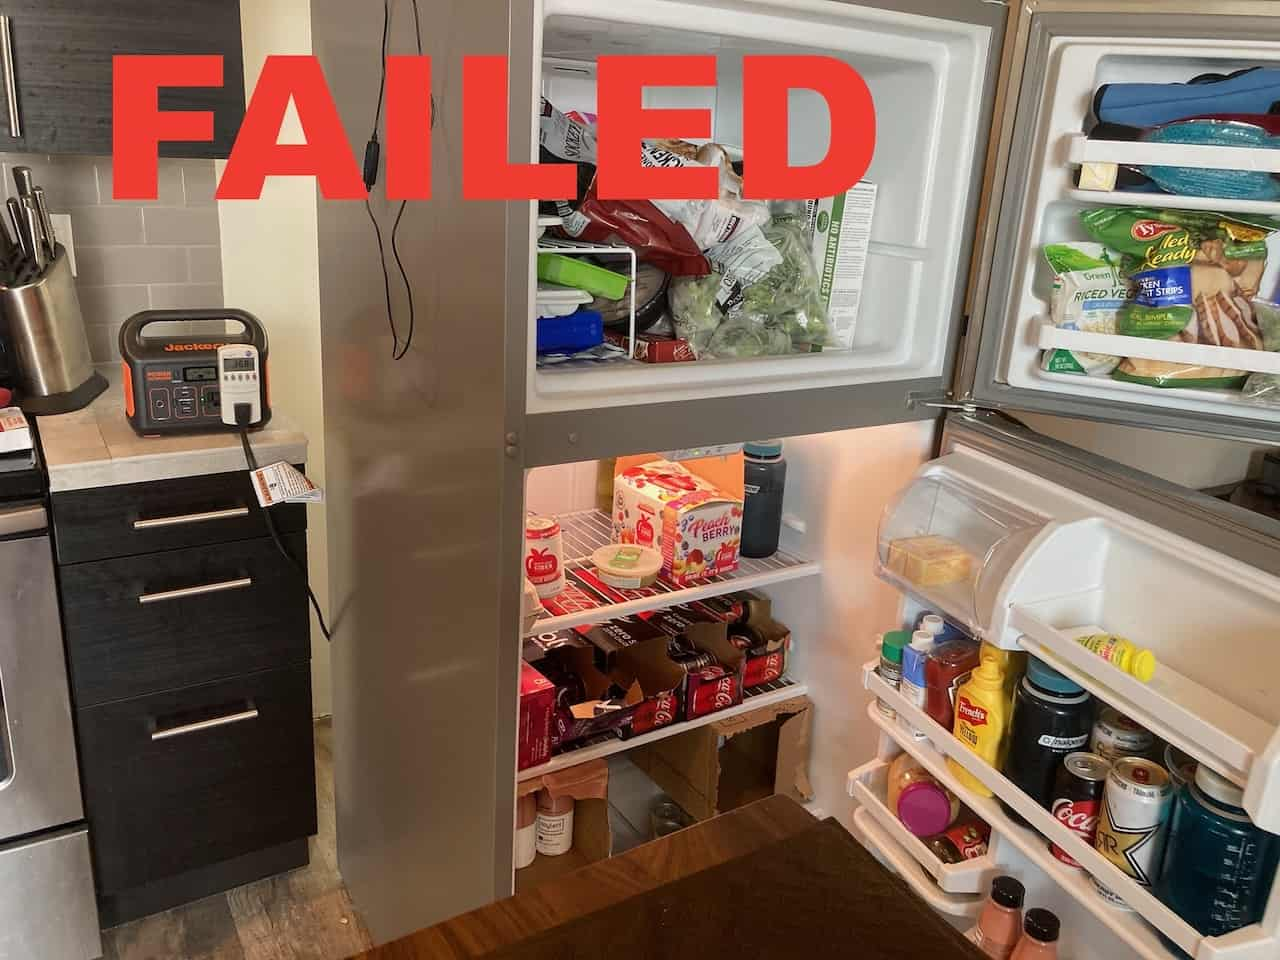 Jackery 300 Failed to Power a normal home refrigerator freezer combo